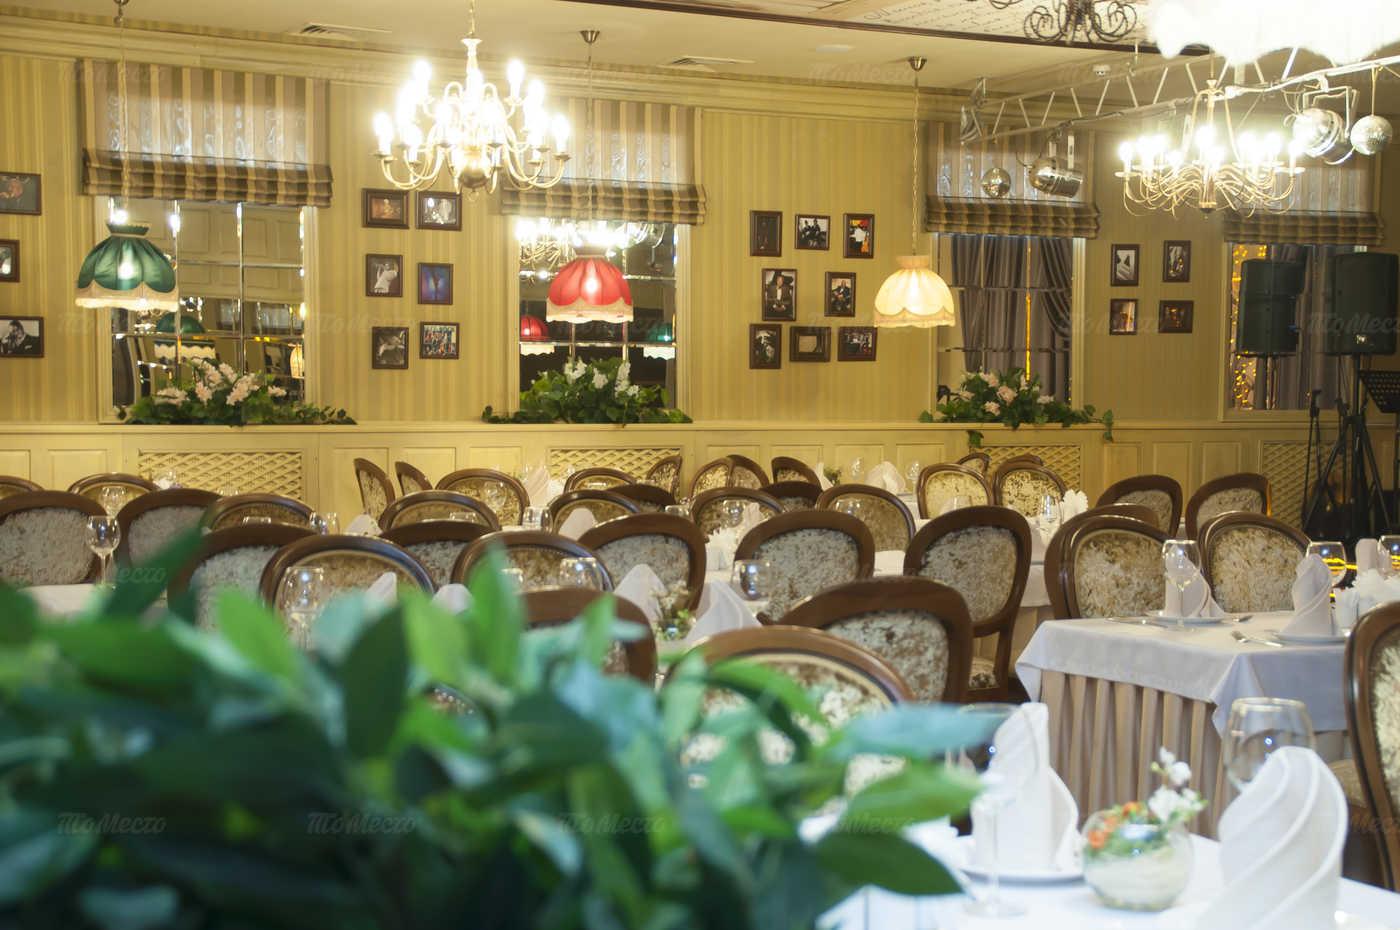 Меню ресторана Перекресток джаза в Карле Марксе